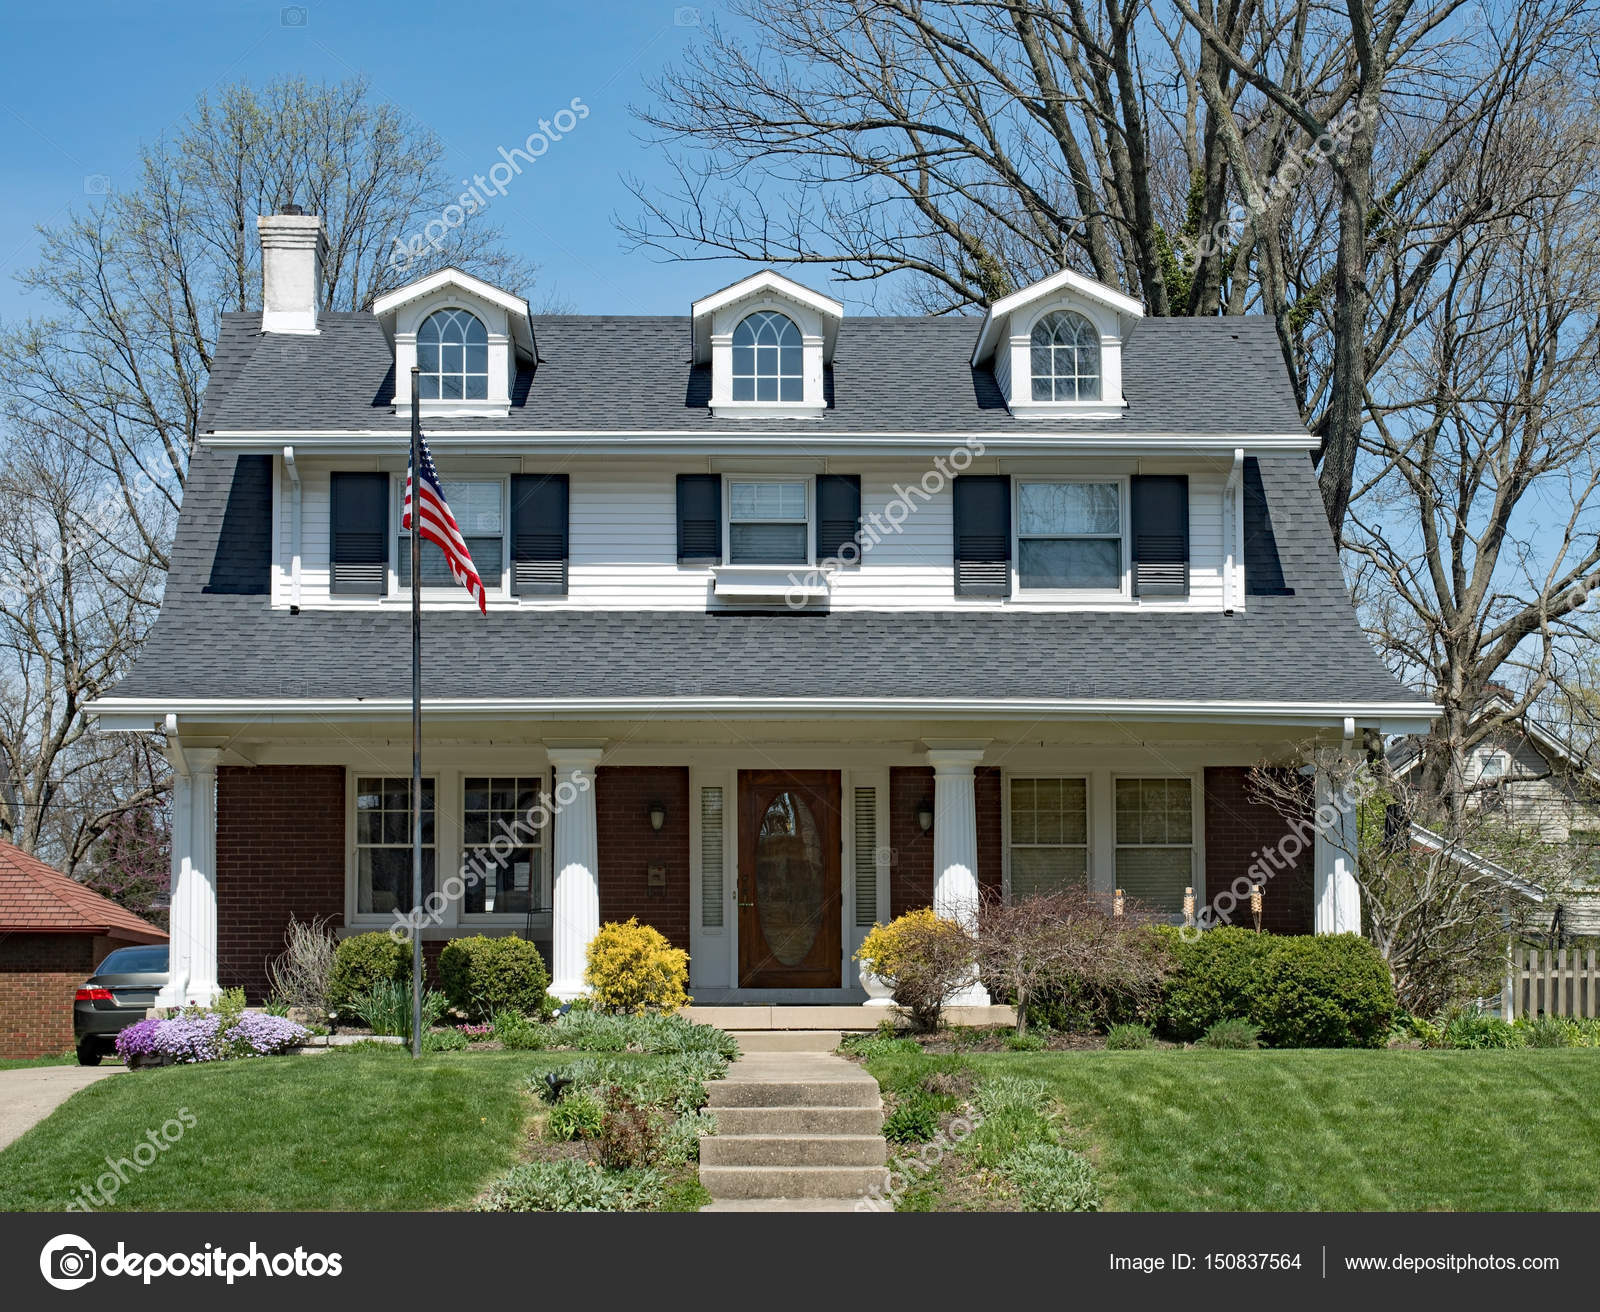 Casa americana temos esse outro modelo de fachada de casa for Case stile americano interni